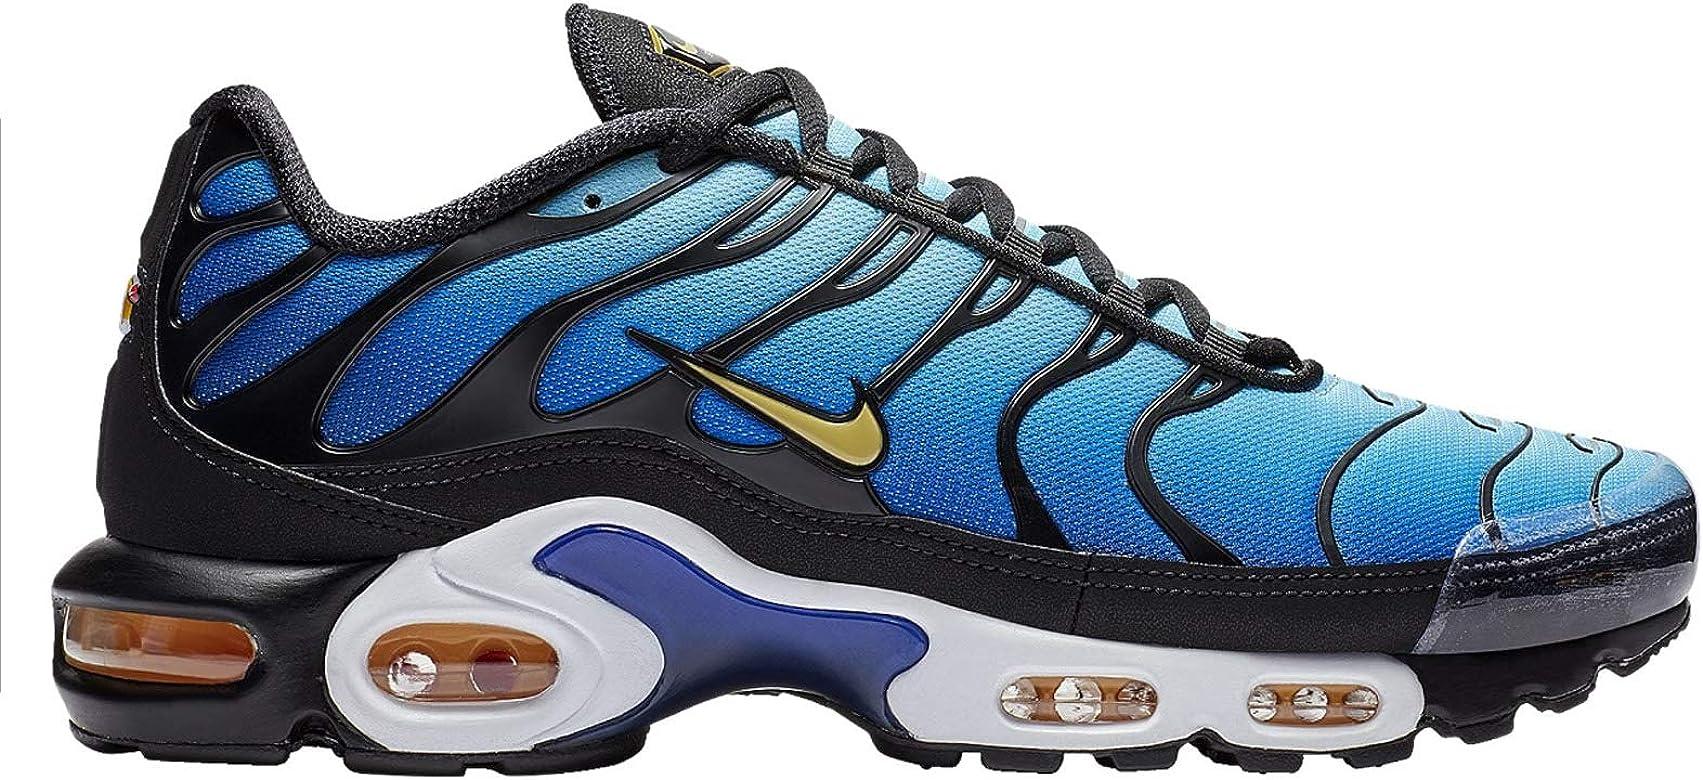 78a846f531205 Men's Air Max Plus Black/Chamois/Sky Blue/Hyper Blue Mesh Running Shoes 12  M US